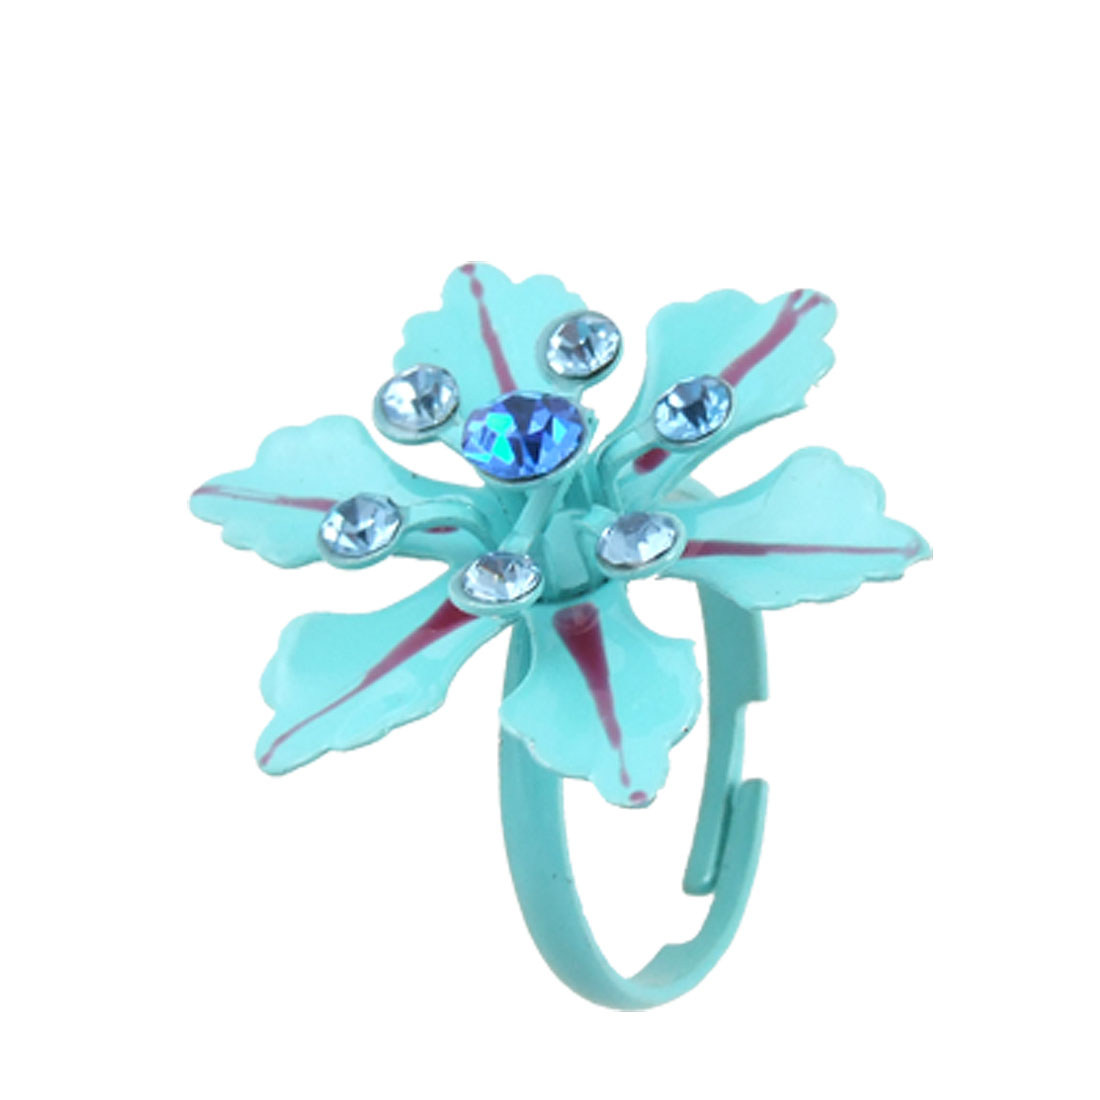 Slim Band Round Cut Ladies Rhinestone Flower Ring Baby Blue US 6 3/4